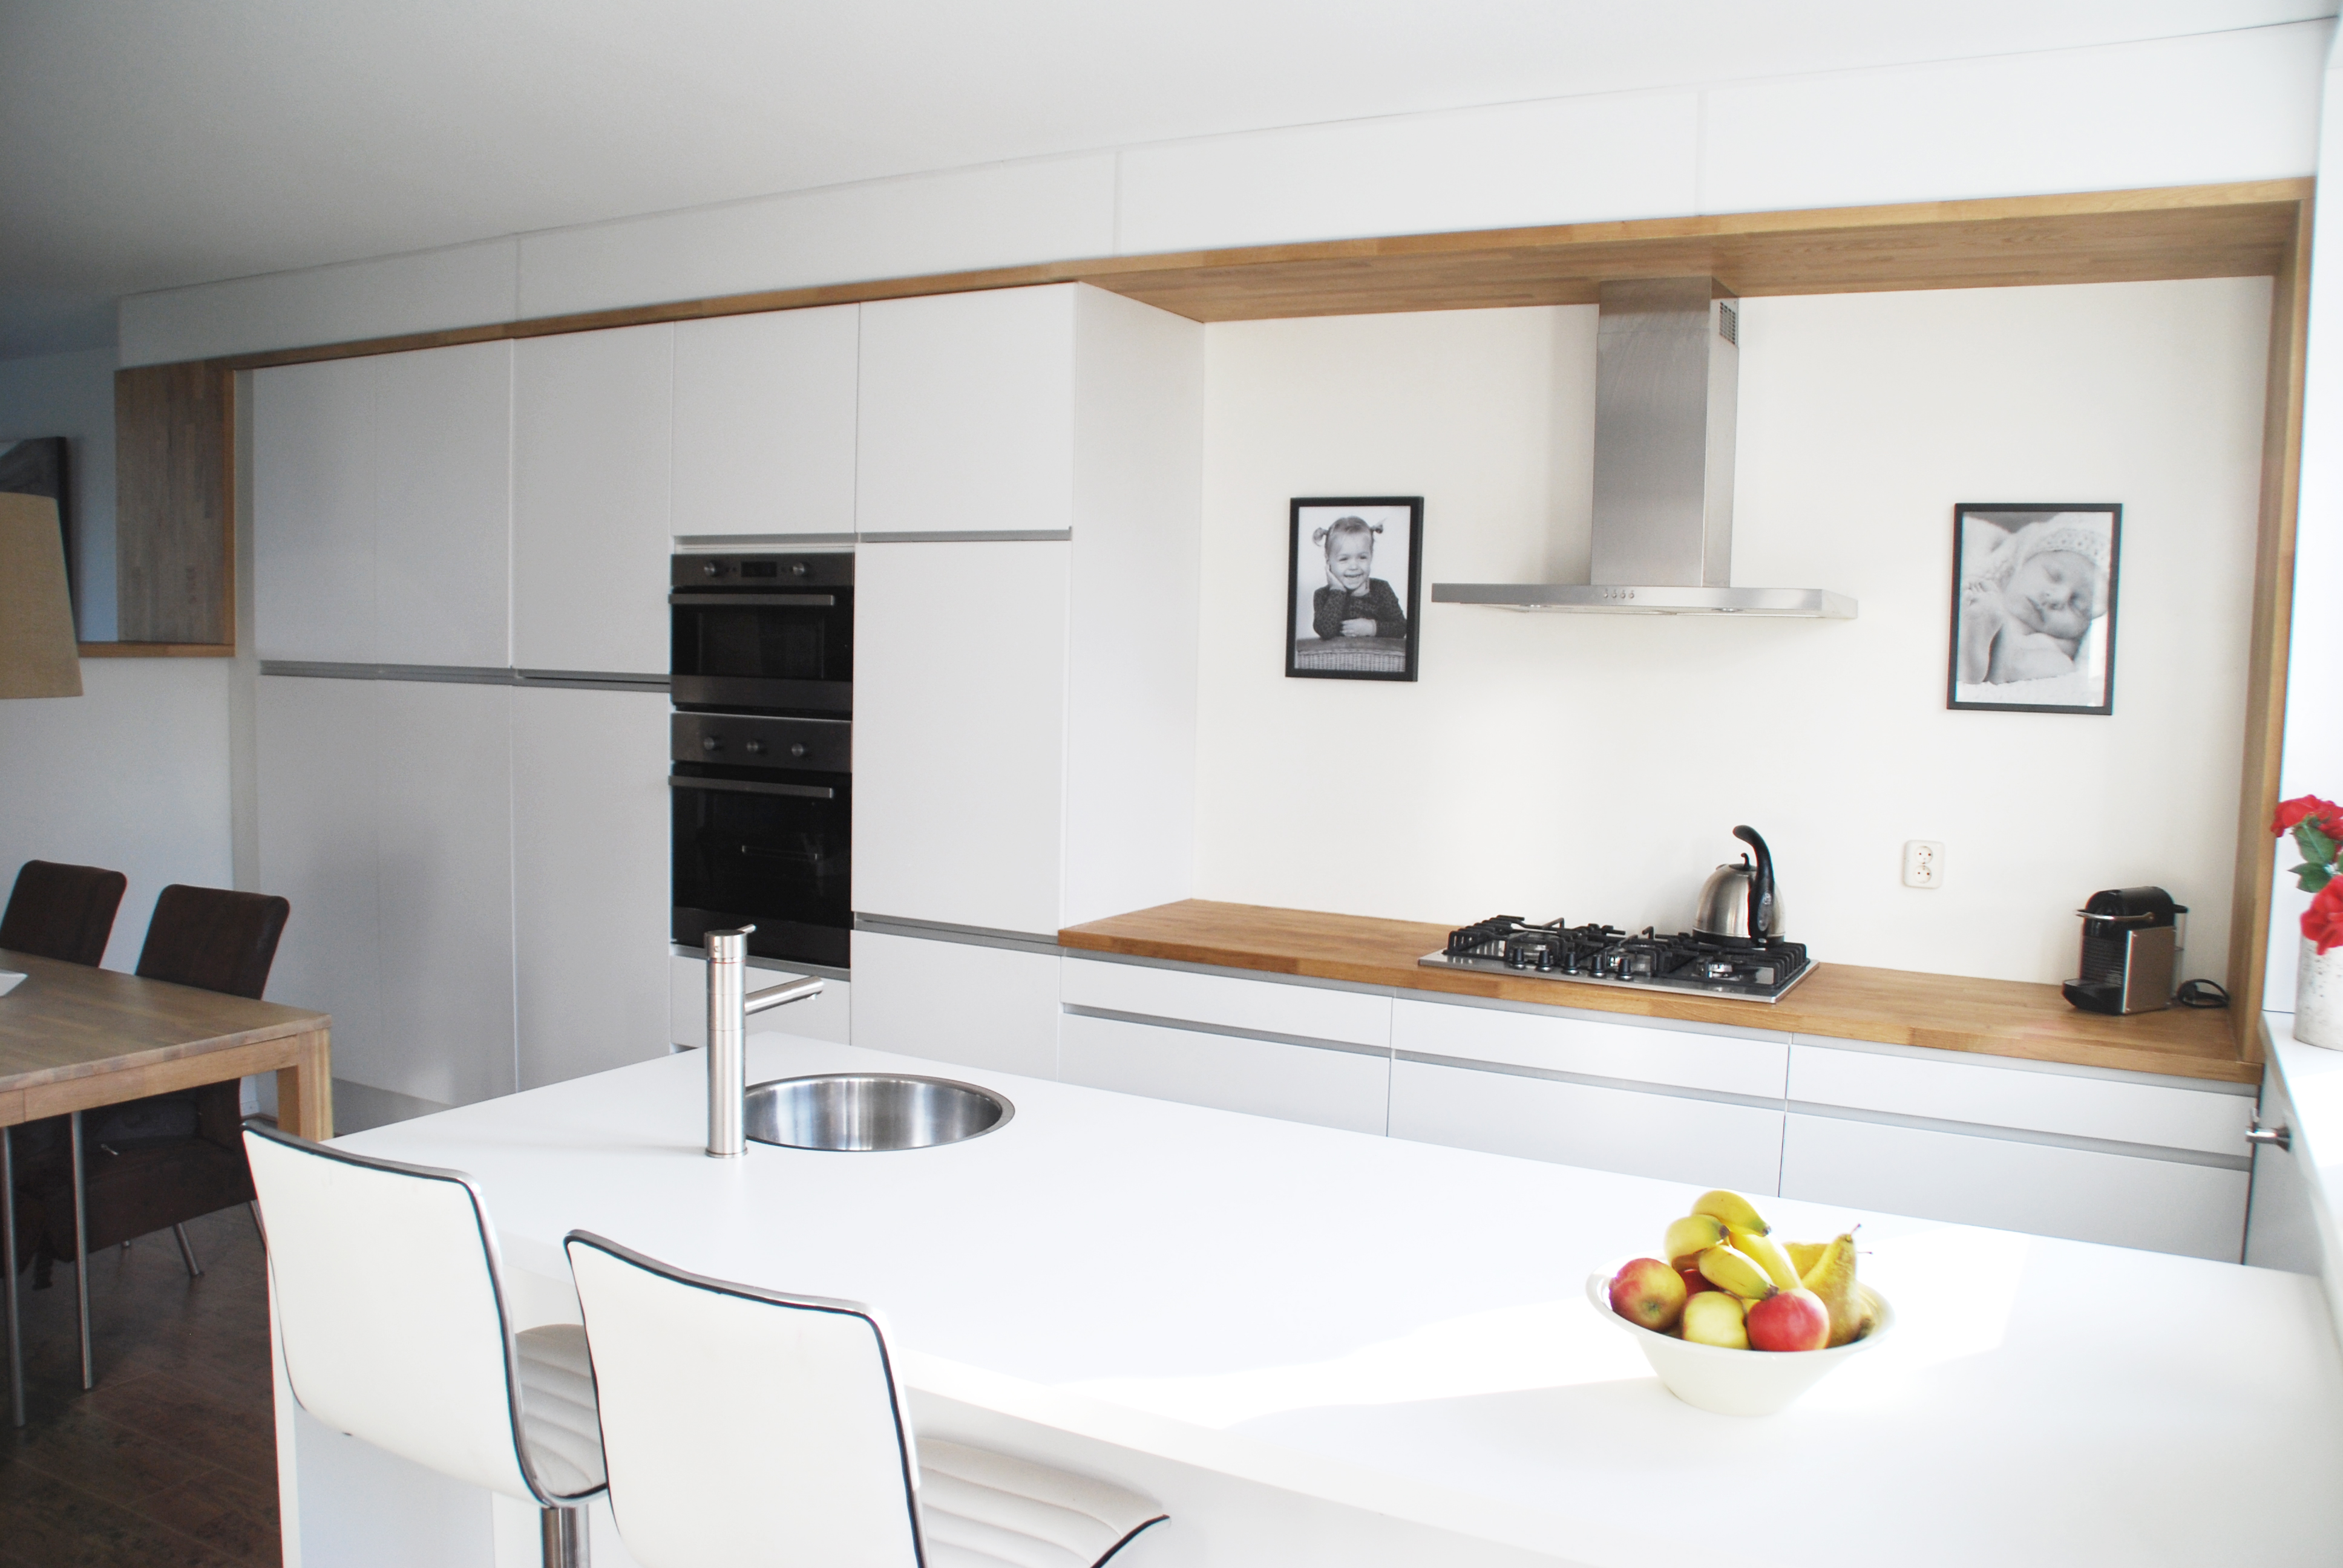 Minimalistische keuken - Keukenontwerp ...